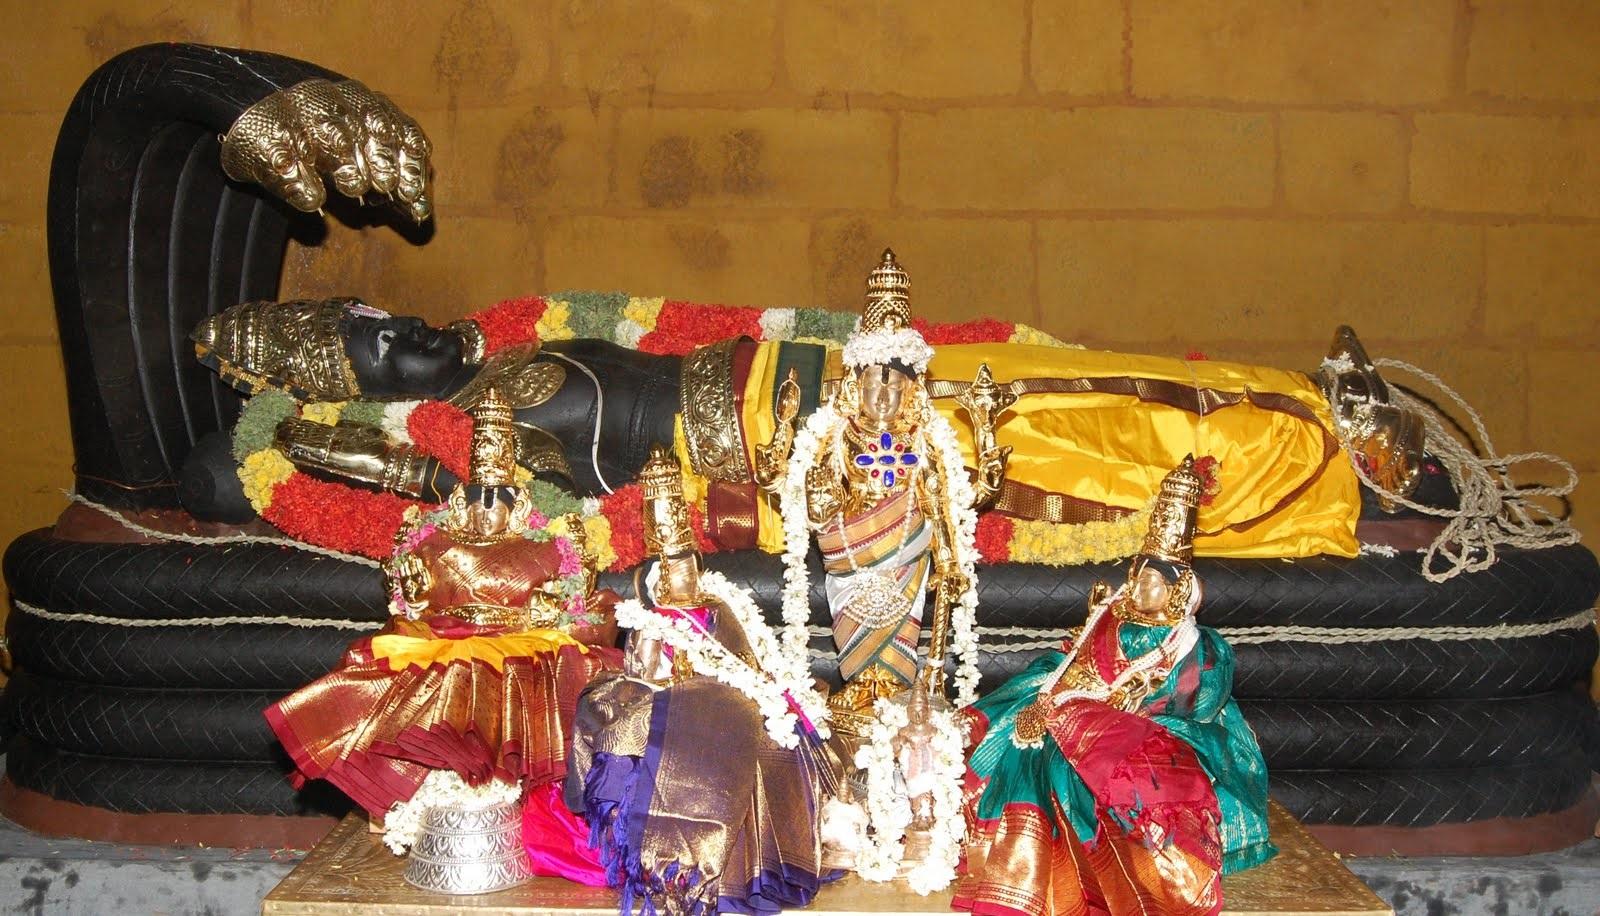 Shiva Lingam Hd Wallpapers Vaikunta Ekadasi Telugu వైకుంట ఏకాదశి Tamil வைகுண்ட